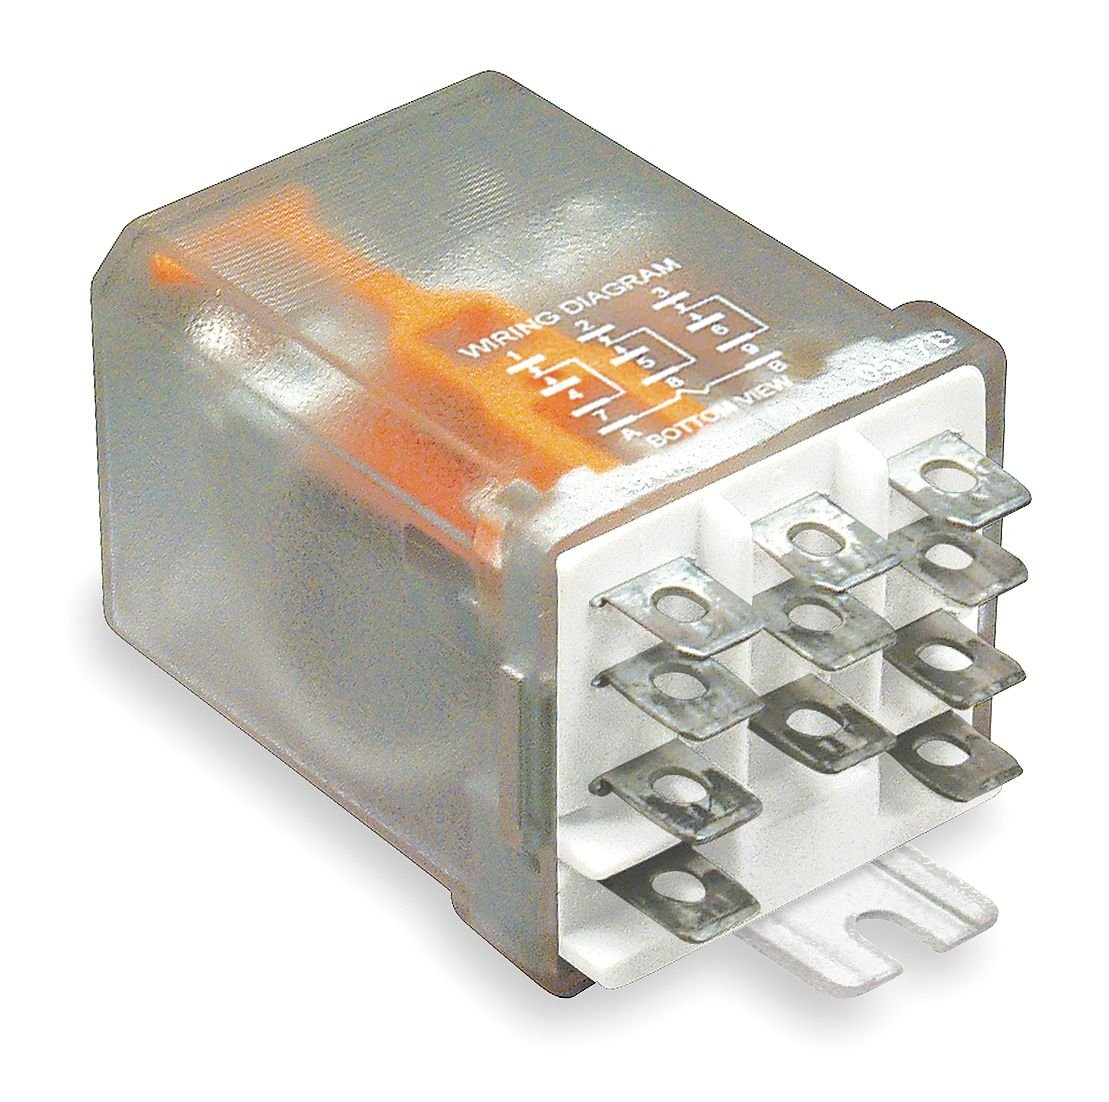 Dayton 1egf6 Relay Power 3pdt 120vac Coil Volts Electronic Hayward Goldline Aqualogic Main Printed Circuit Board Glxpcbmain Relays Industrial Scientific